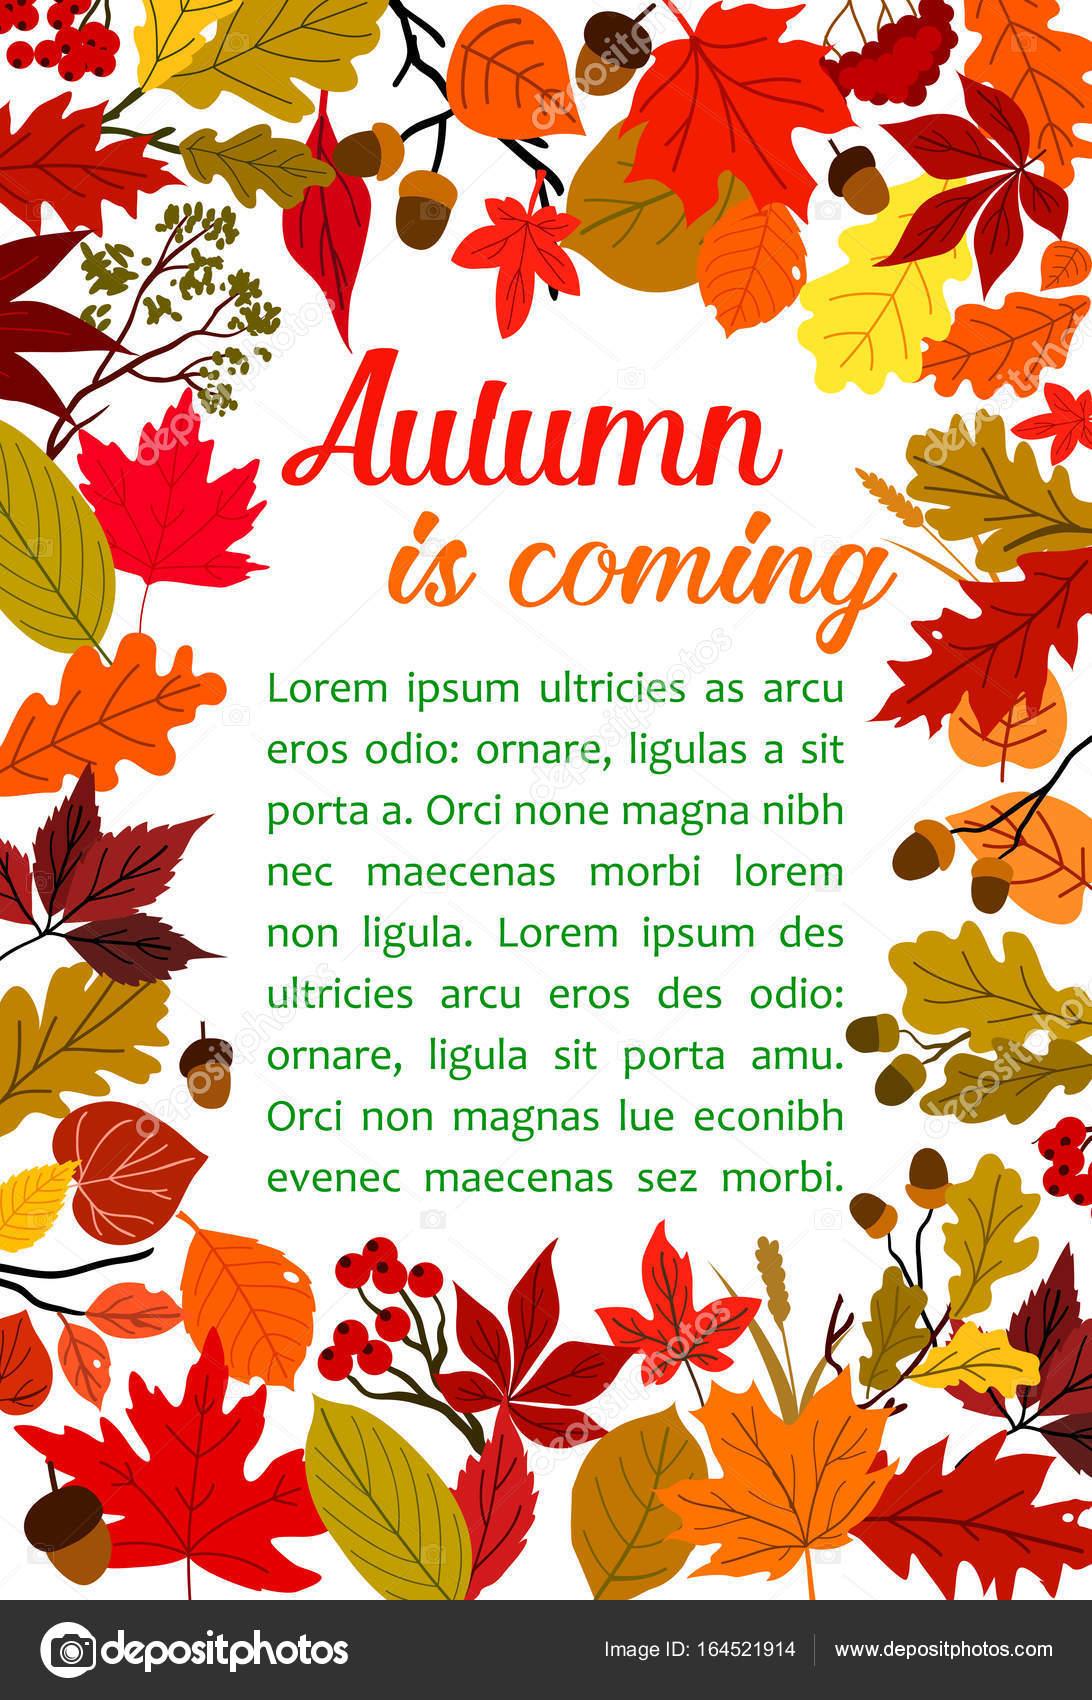 Herbst Blatt Poster mit Herbst Natur Rahmen — Stockvektor ...